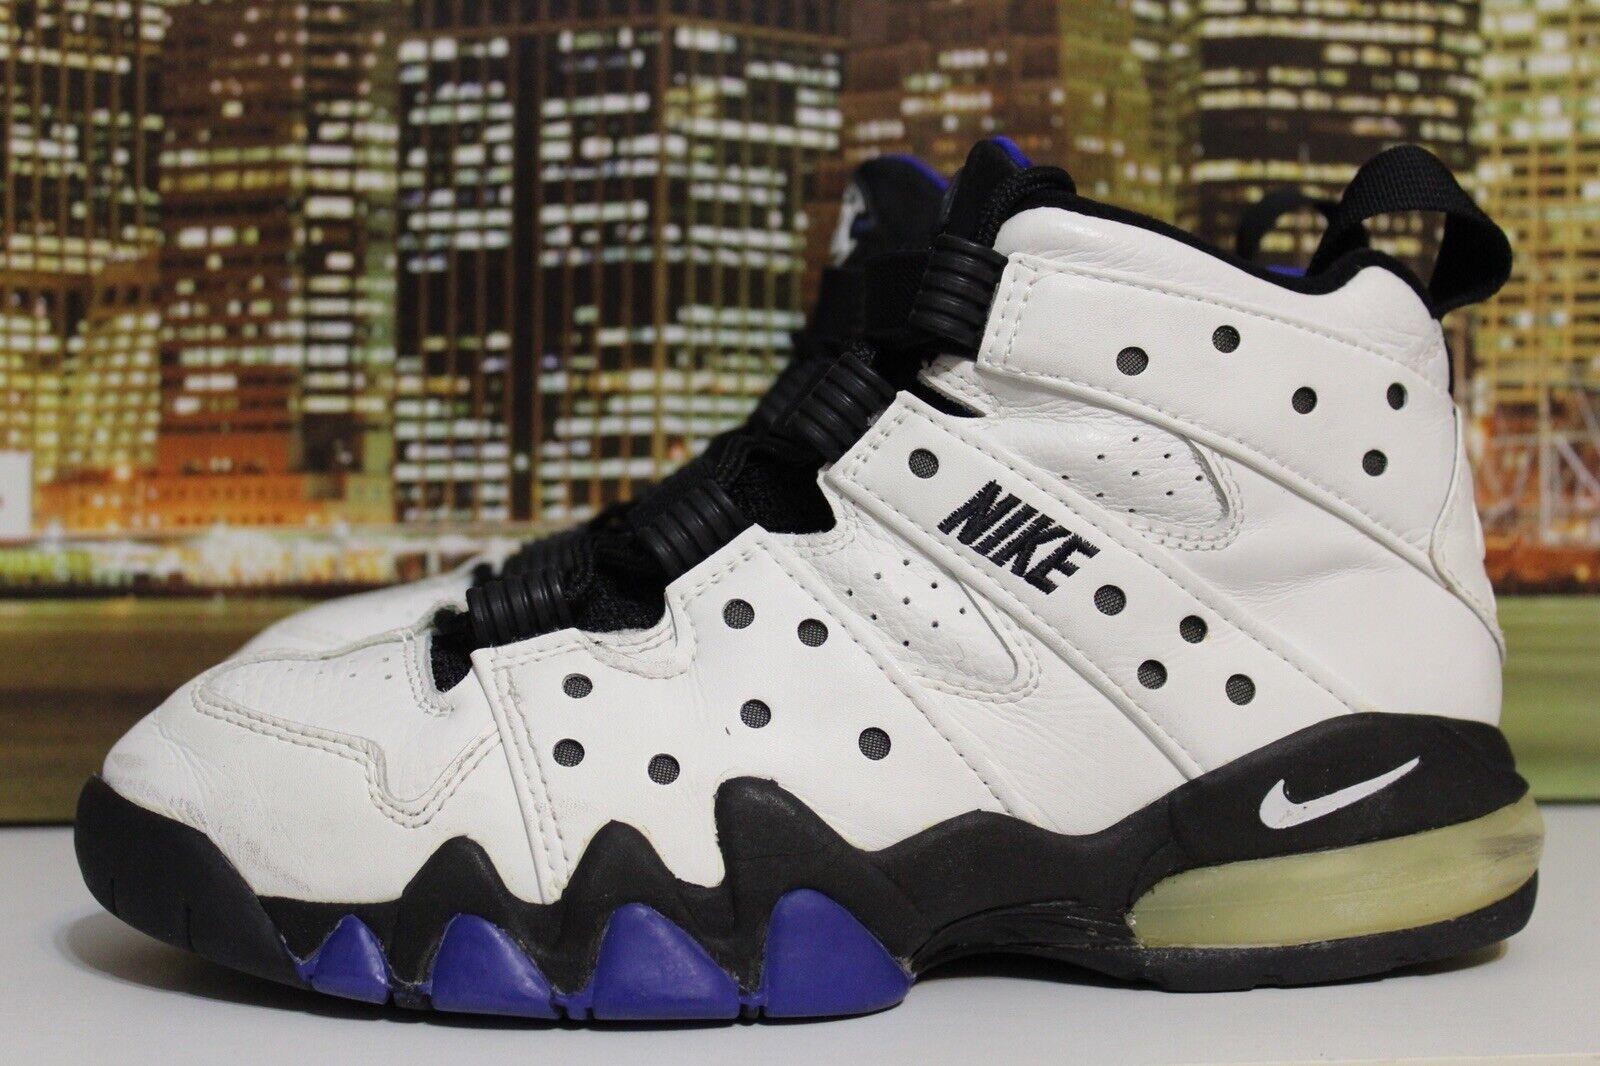 VTG 90s Nike Air Max 2 Barkley White Ultramarine 1994 Basketball Sneakers Sz 10